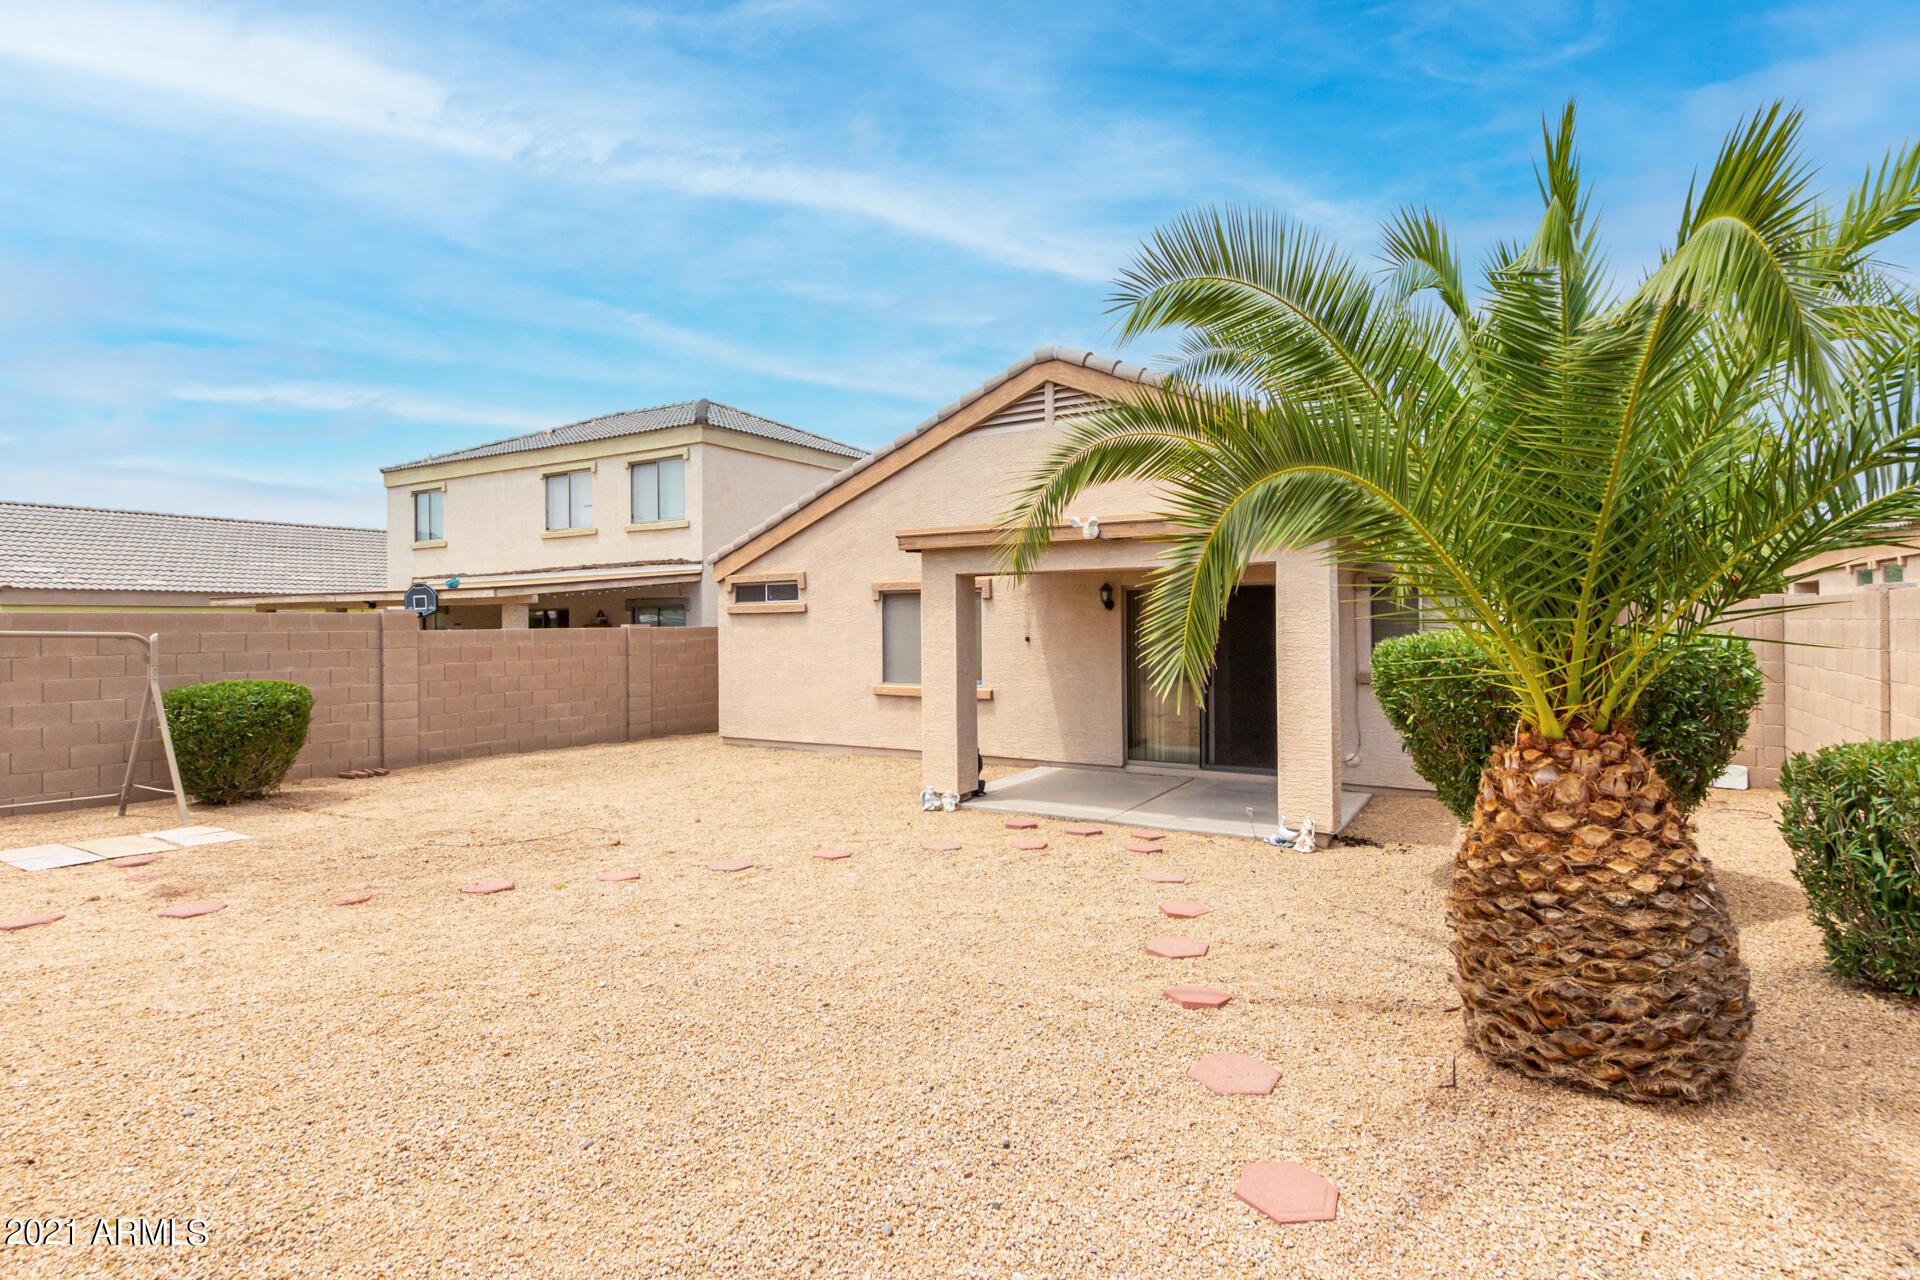 MLS 6268246 13001 N 127TH Lane, El Mirage, AZ 85335 El Mirage AZ Three Bedroom